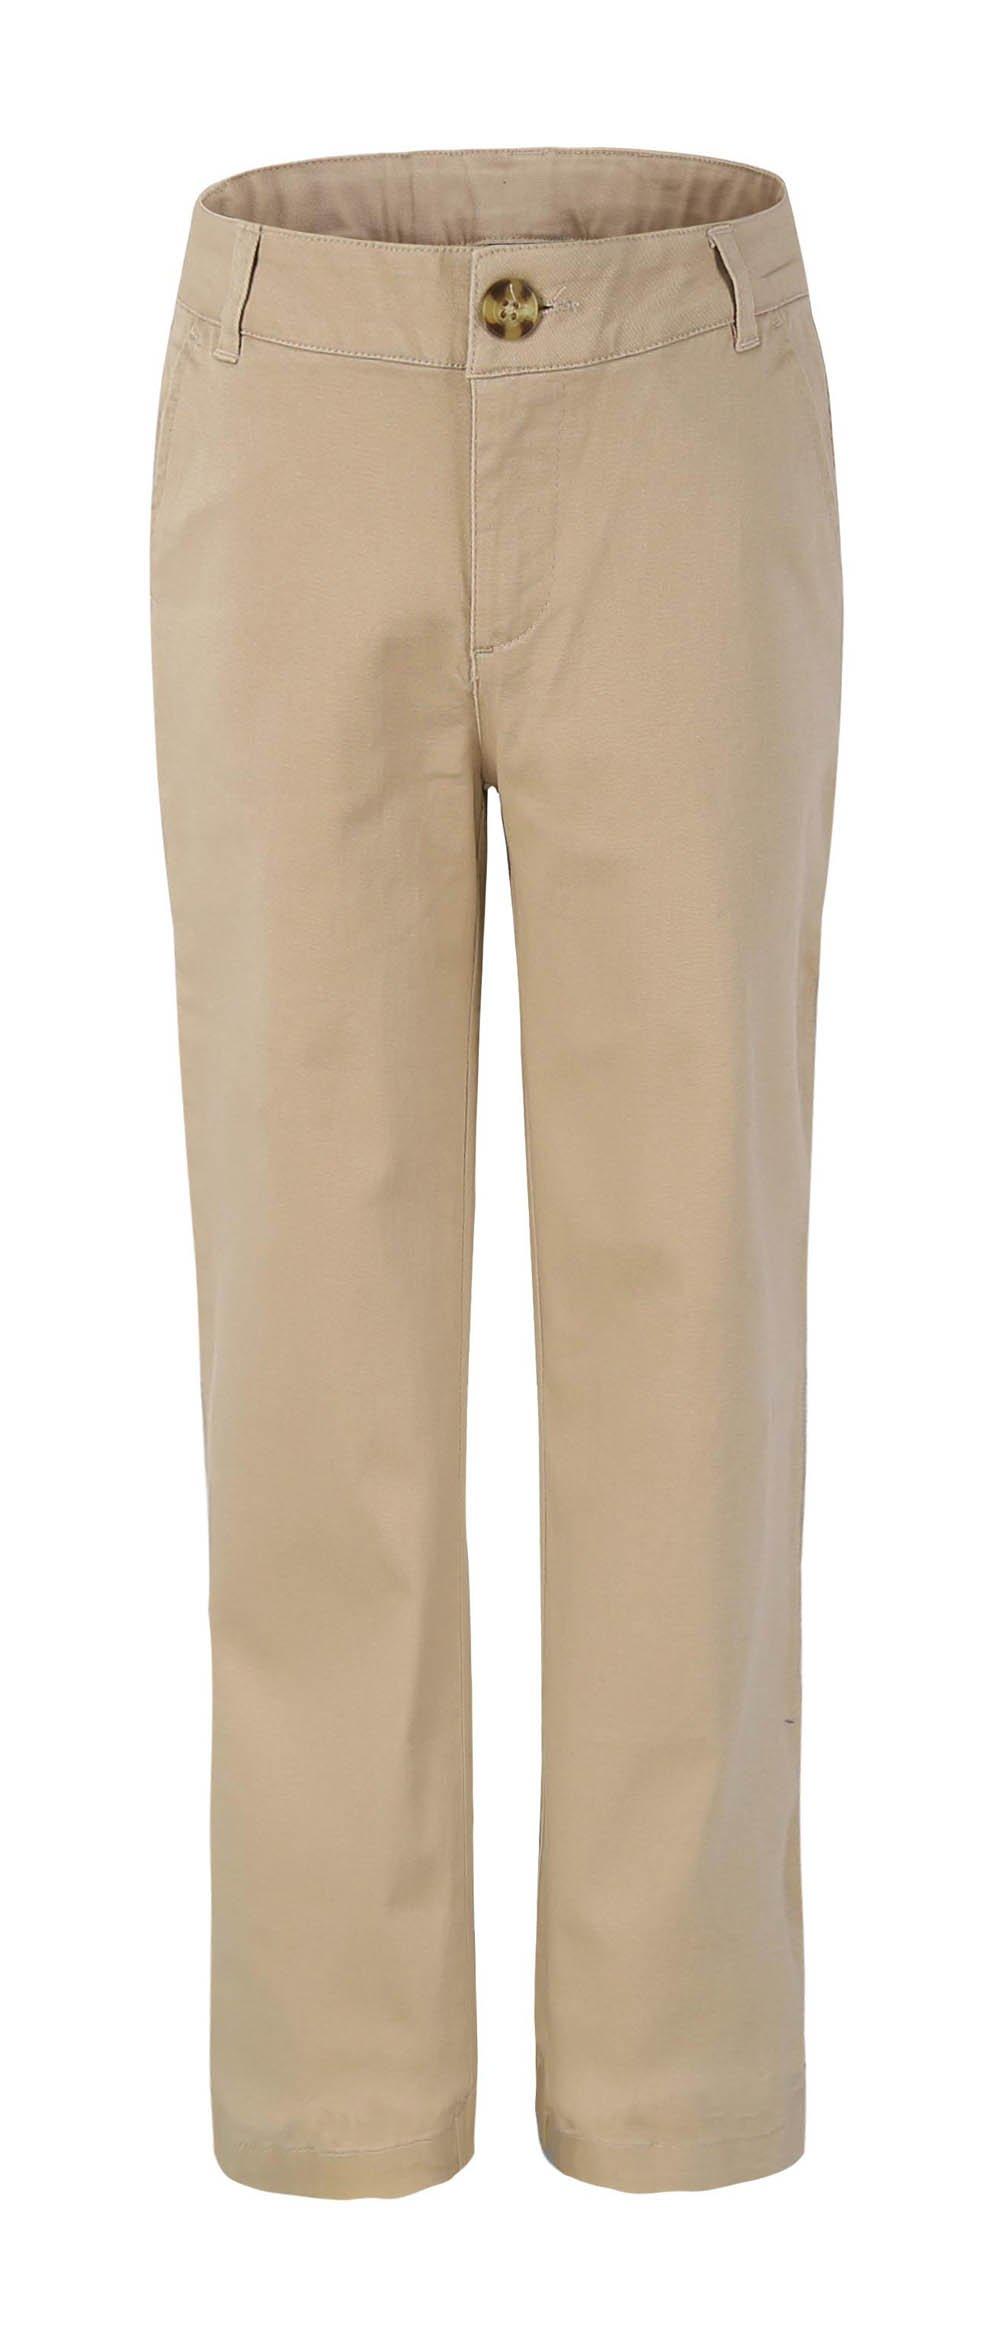 Bienzoe Girl's School Uniforms Stretchy Twill Adjust Waist Flat Front Pants Khaki Size 14